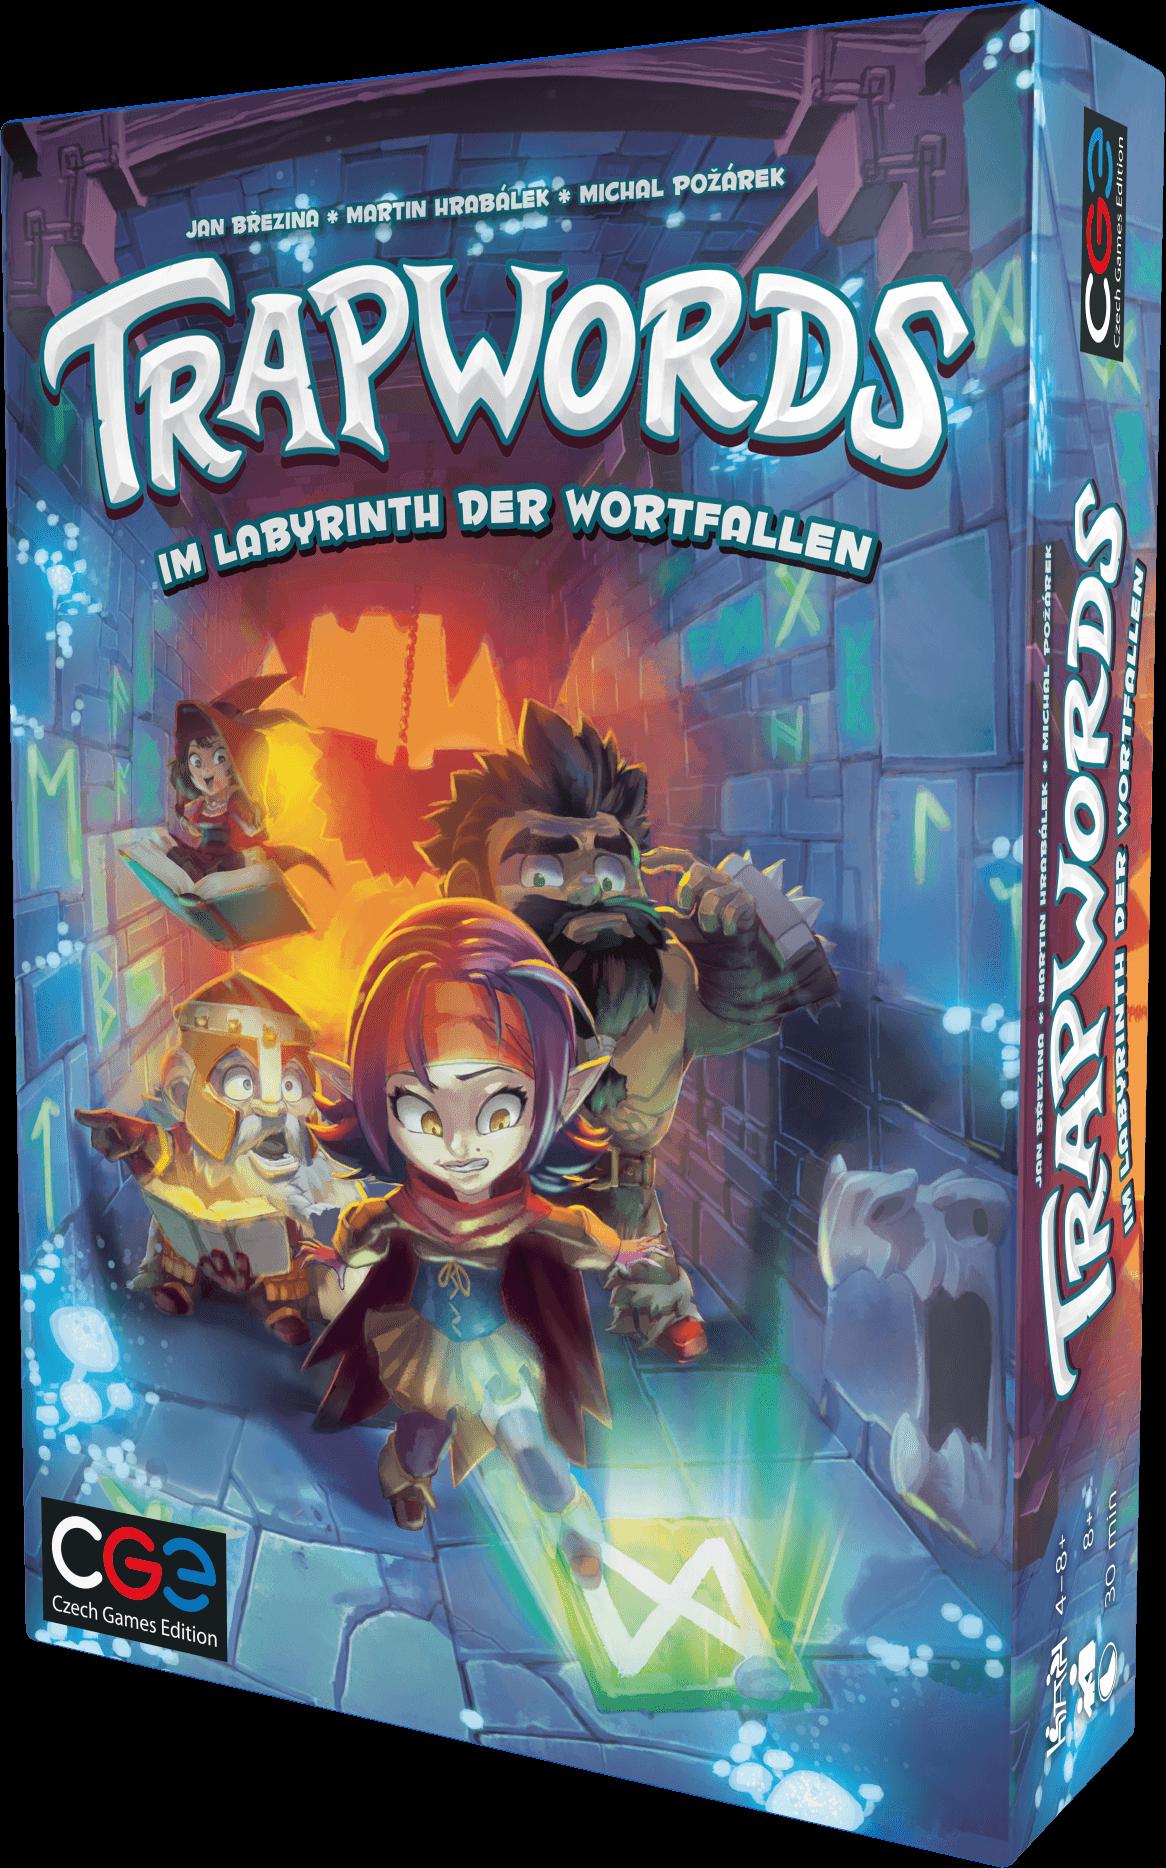 trapwords box